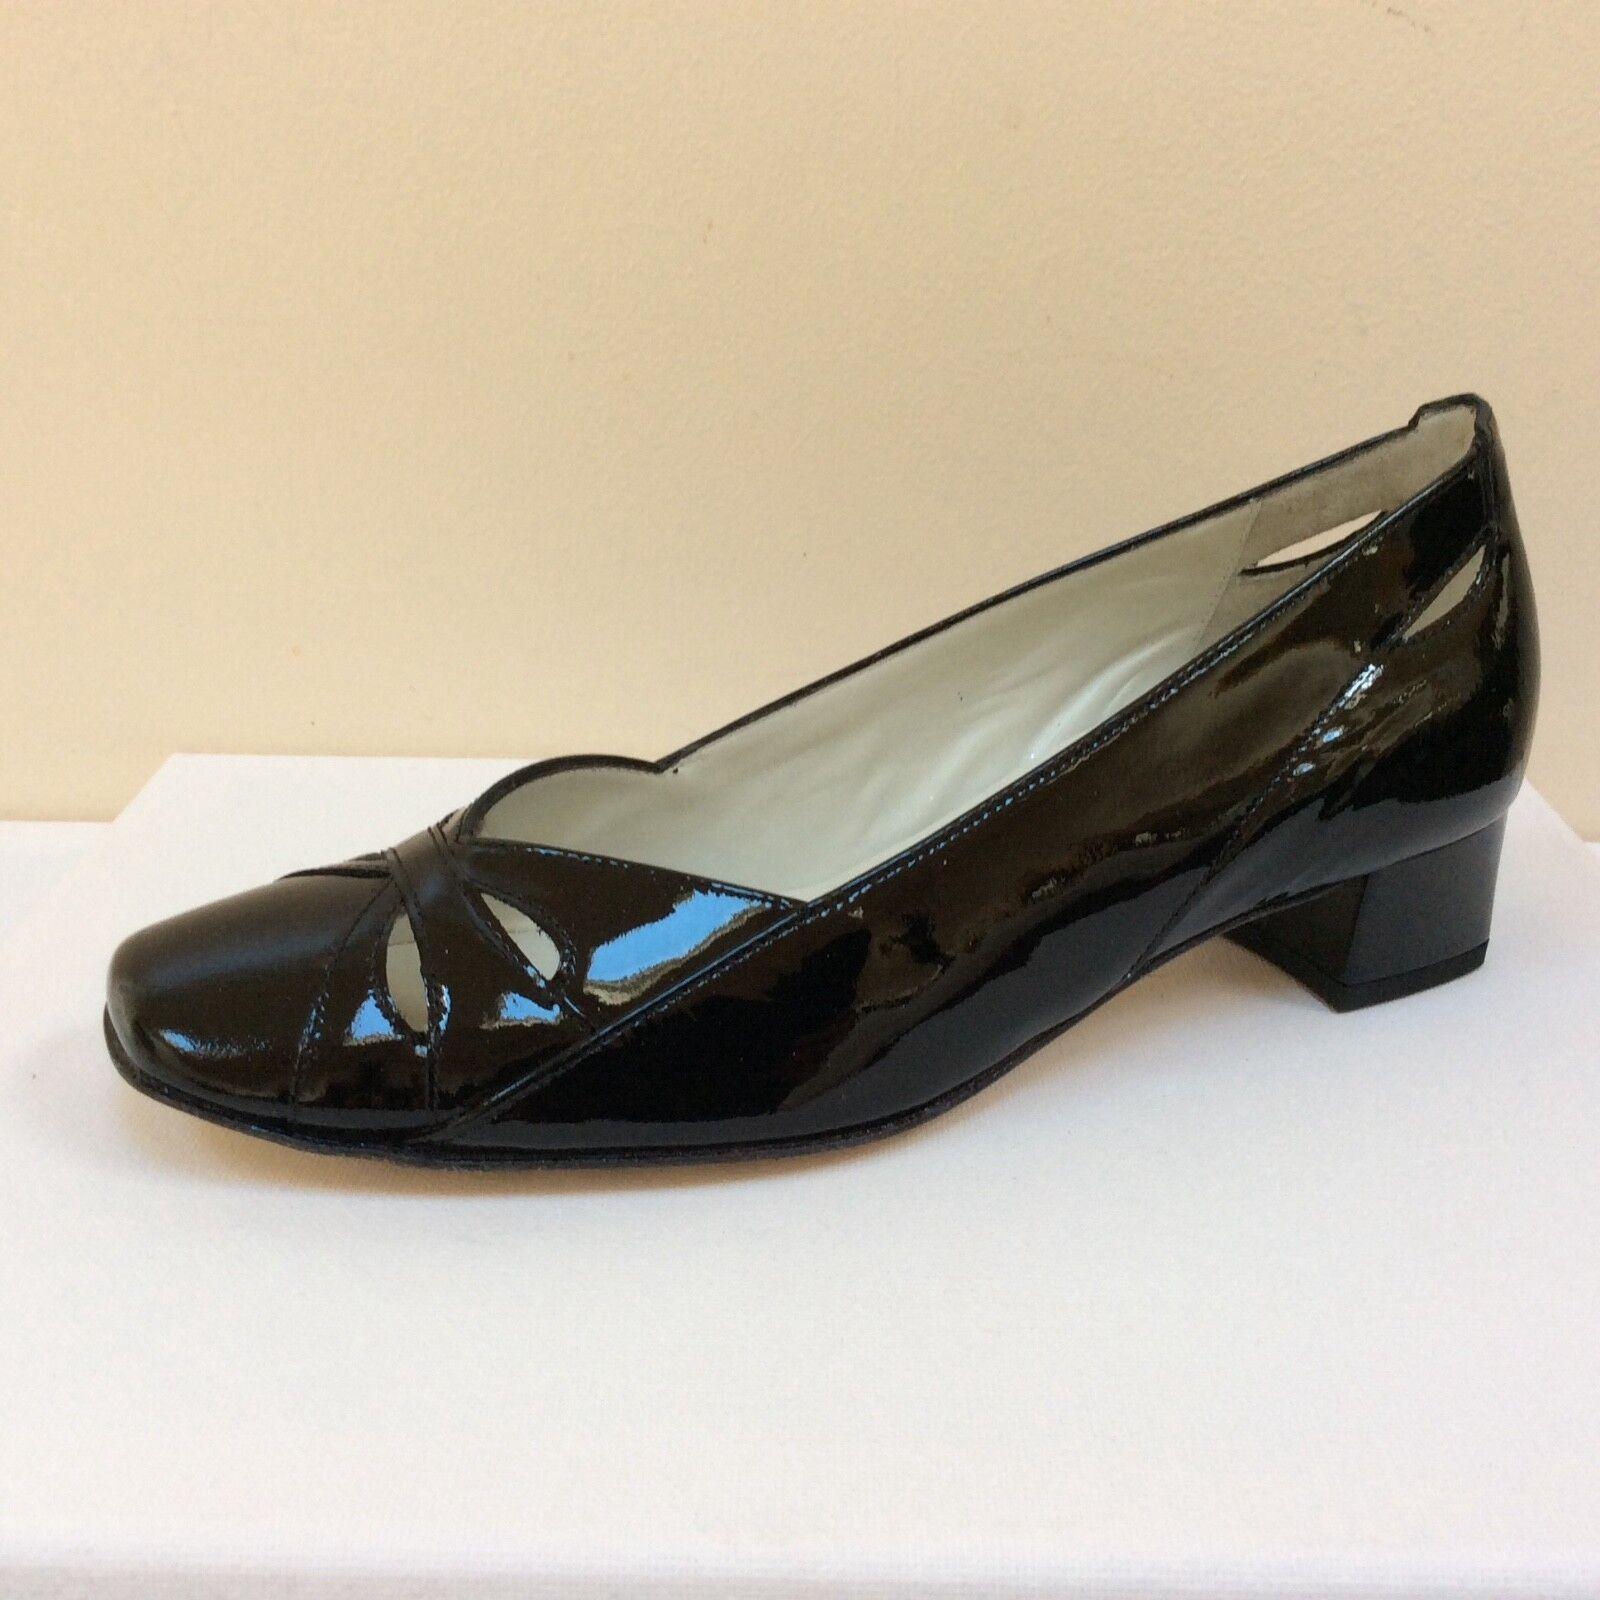 Hogl schwarz patent Leder court schuhe, UK 7,   BNWB